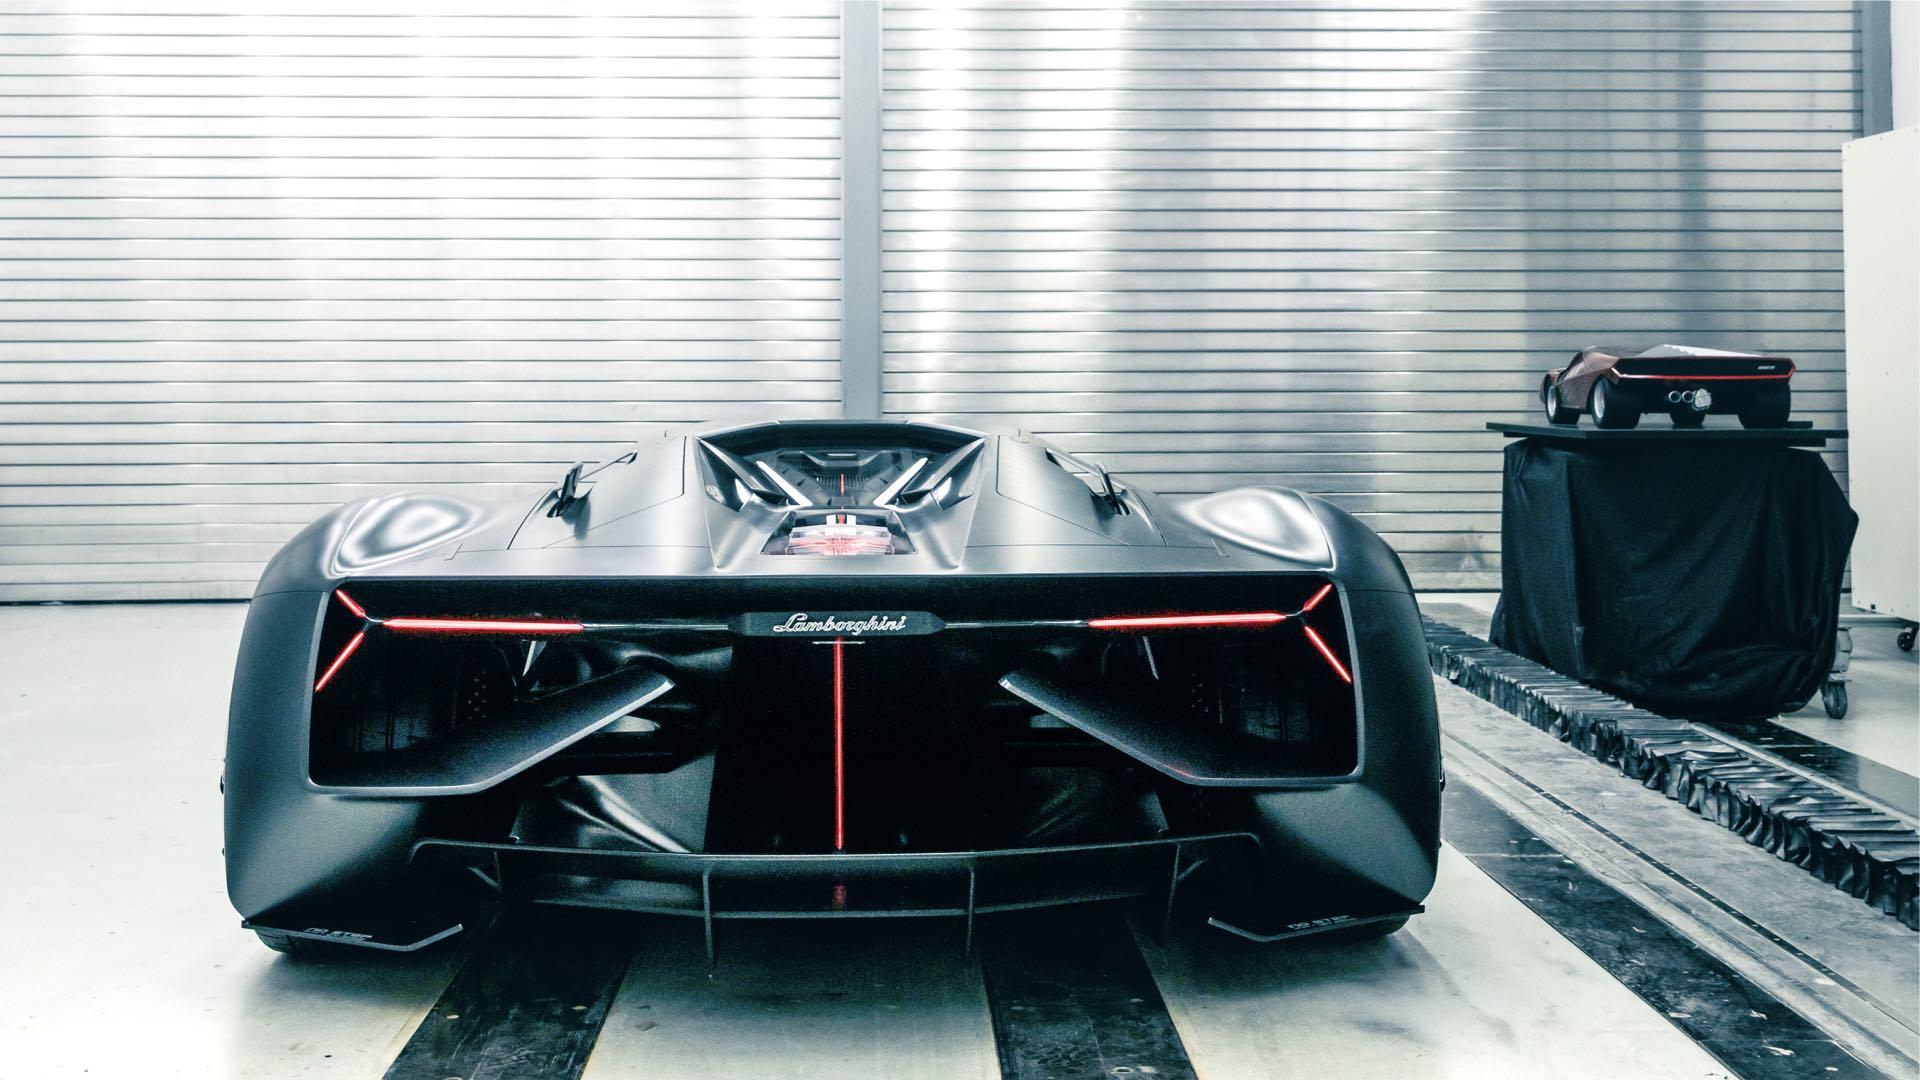 Lamborghini Terzo Millennio - 2017 - rear / arrière